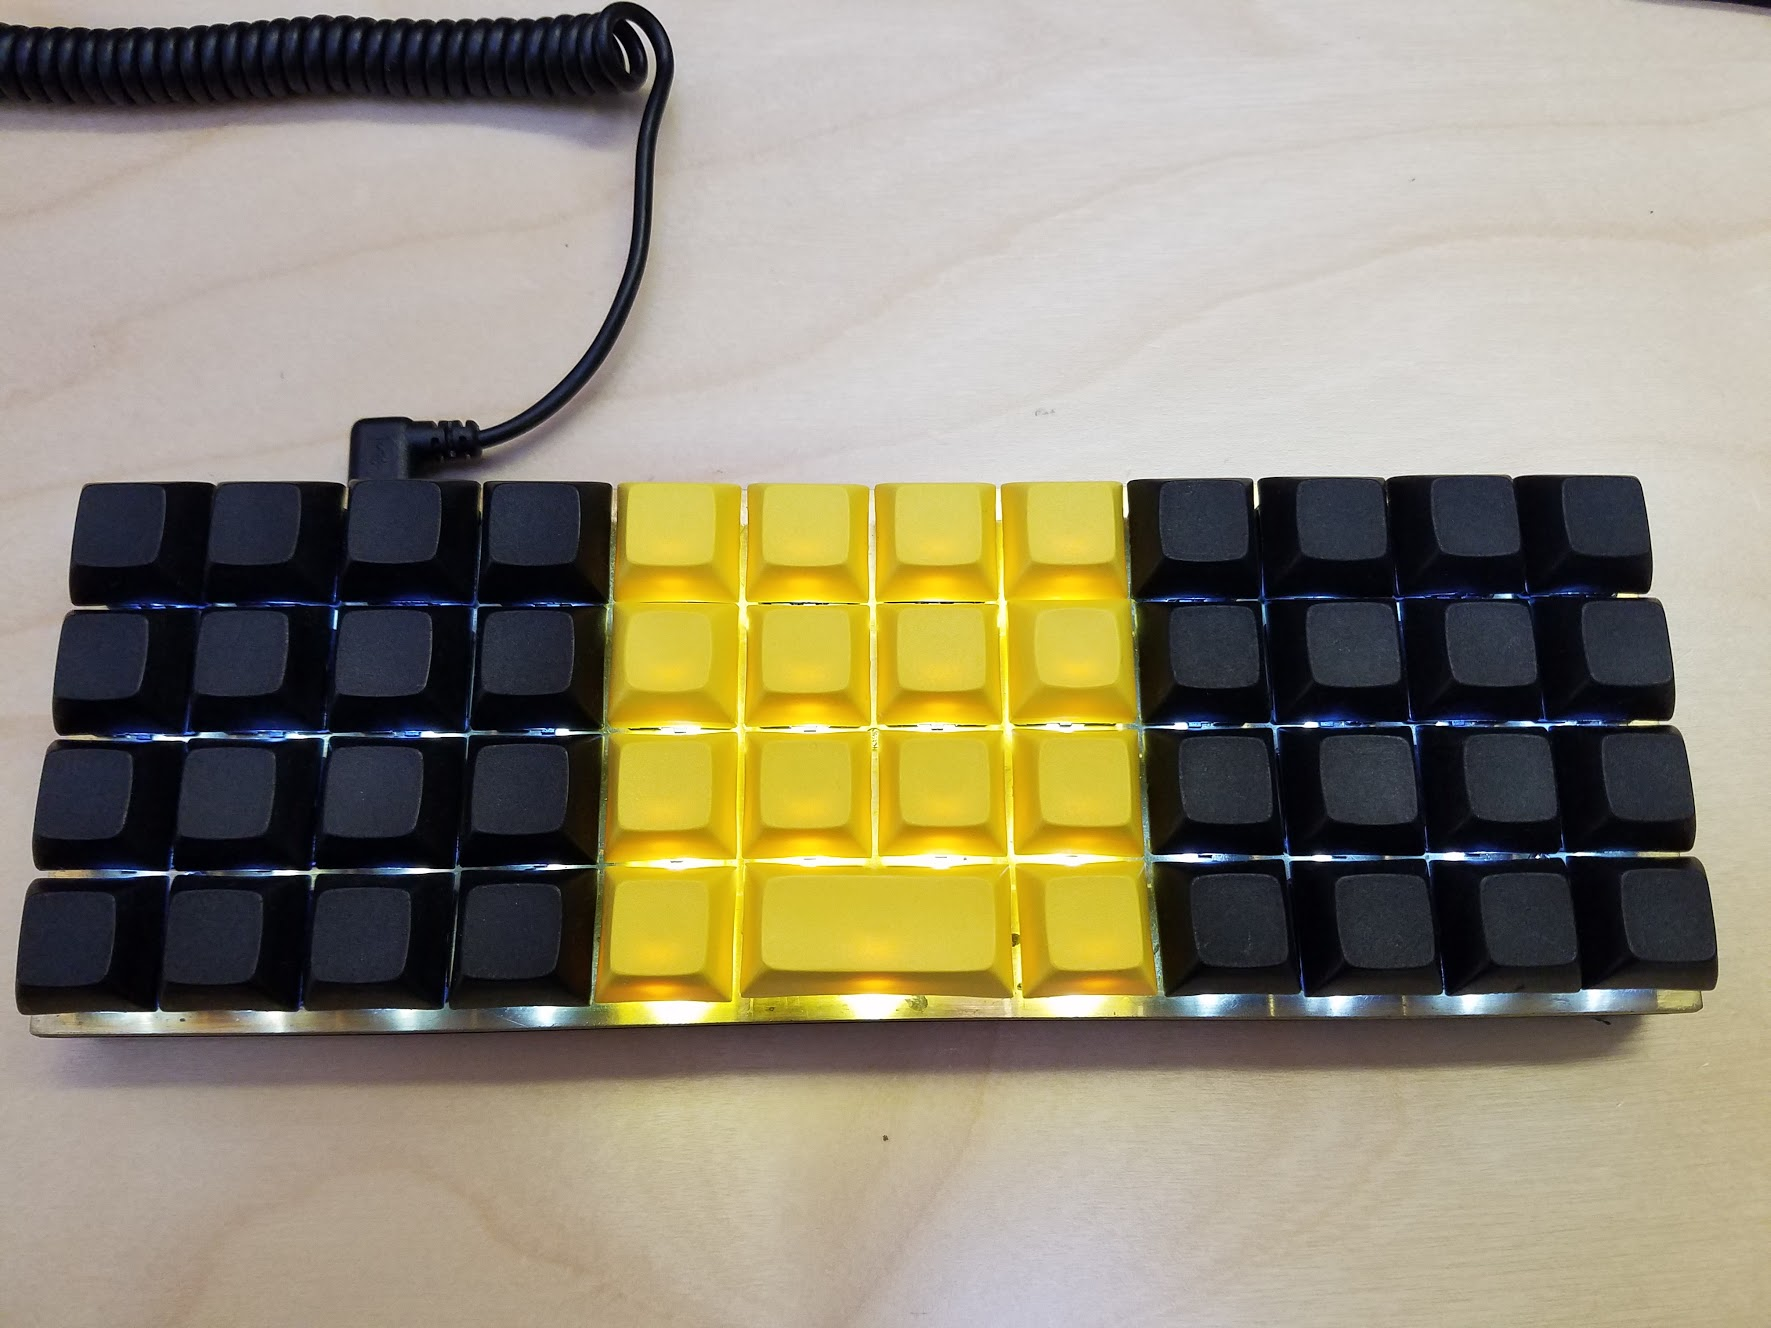 Planck Keyboard Layout Editor – Fashionsneakers club